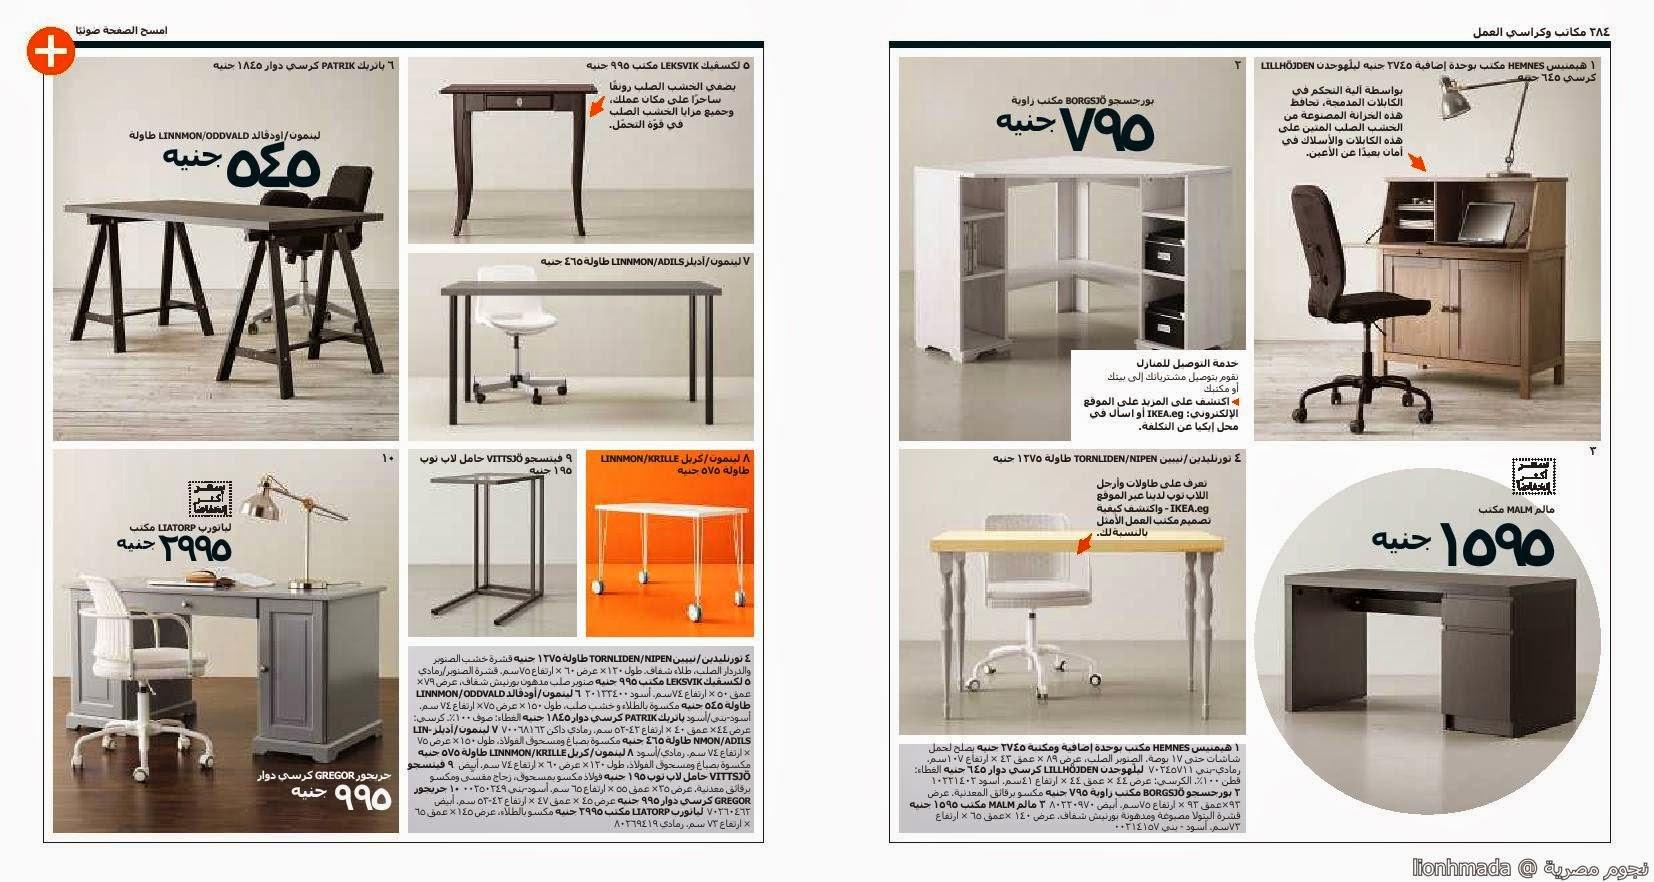 imgc575b954c2fdc261da862a68ff997bf0 صور كتالوج ايكيا مصر ikia للديكورات